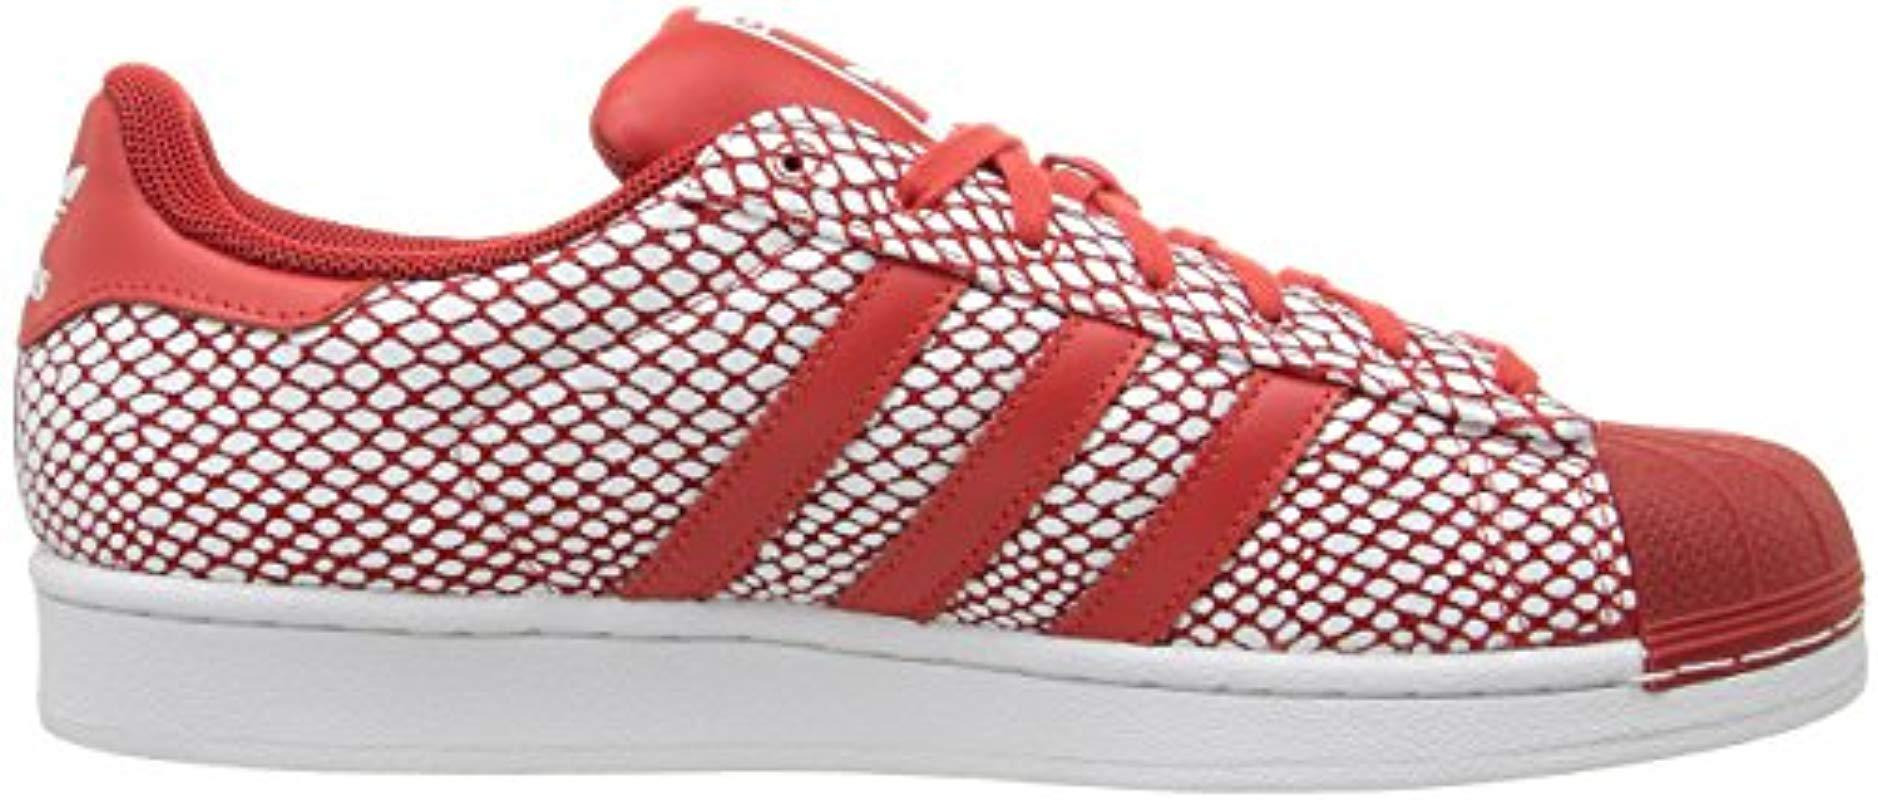 adidas superstar red snake amazon